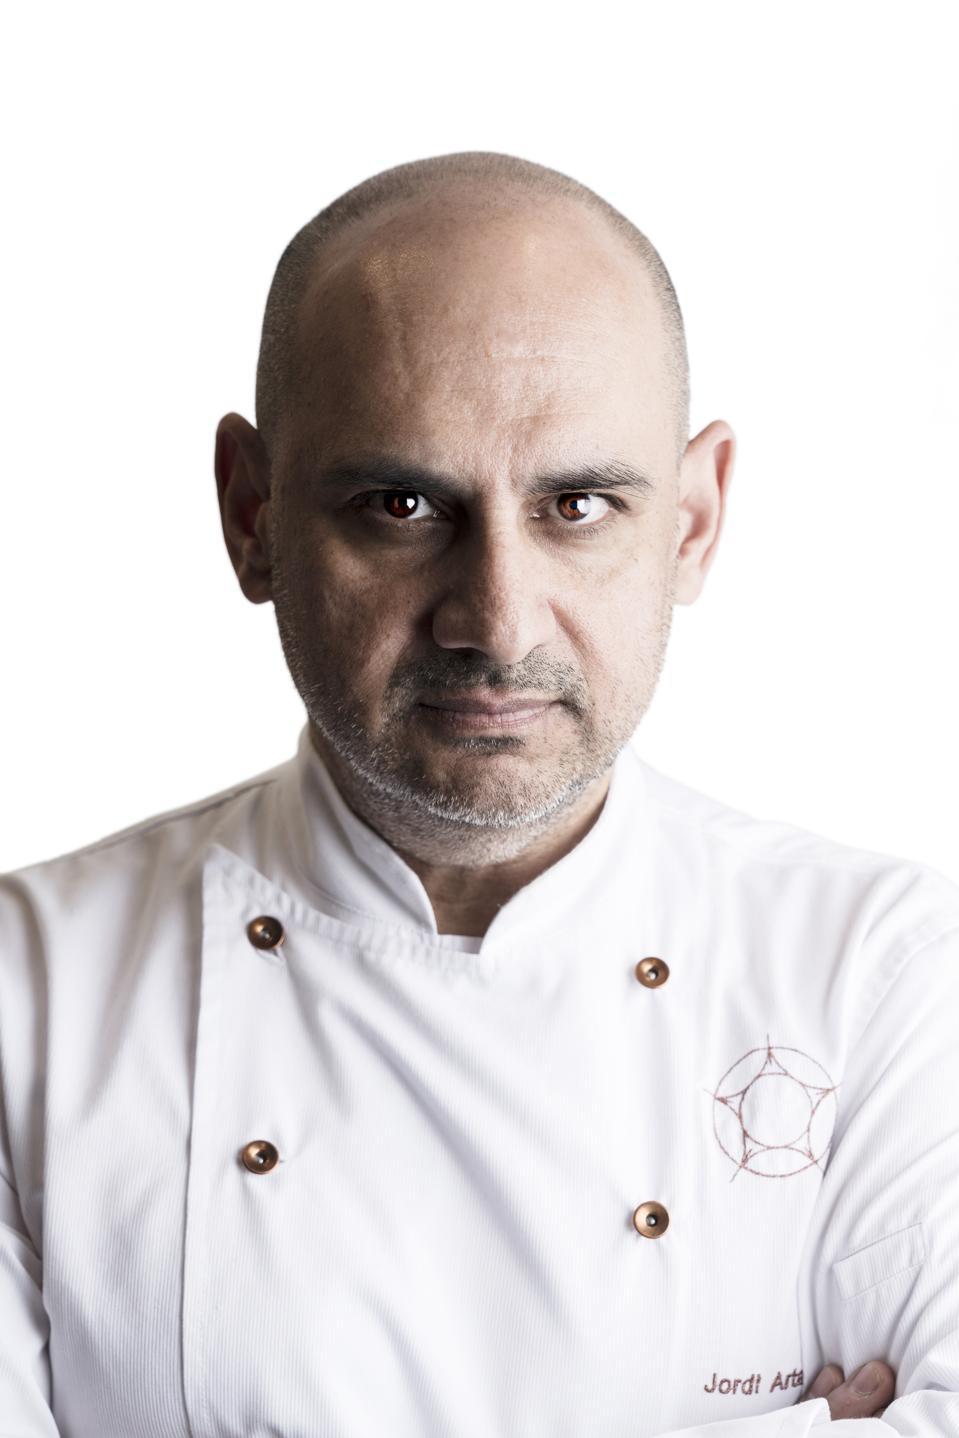 Portrait of Chef Jordi Artal